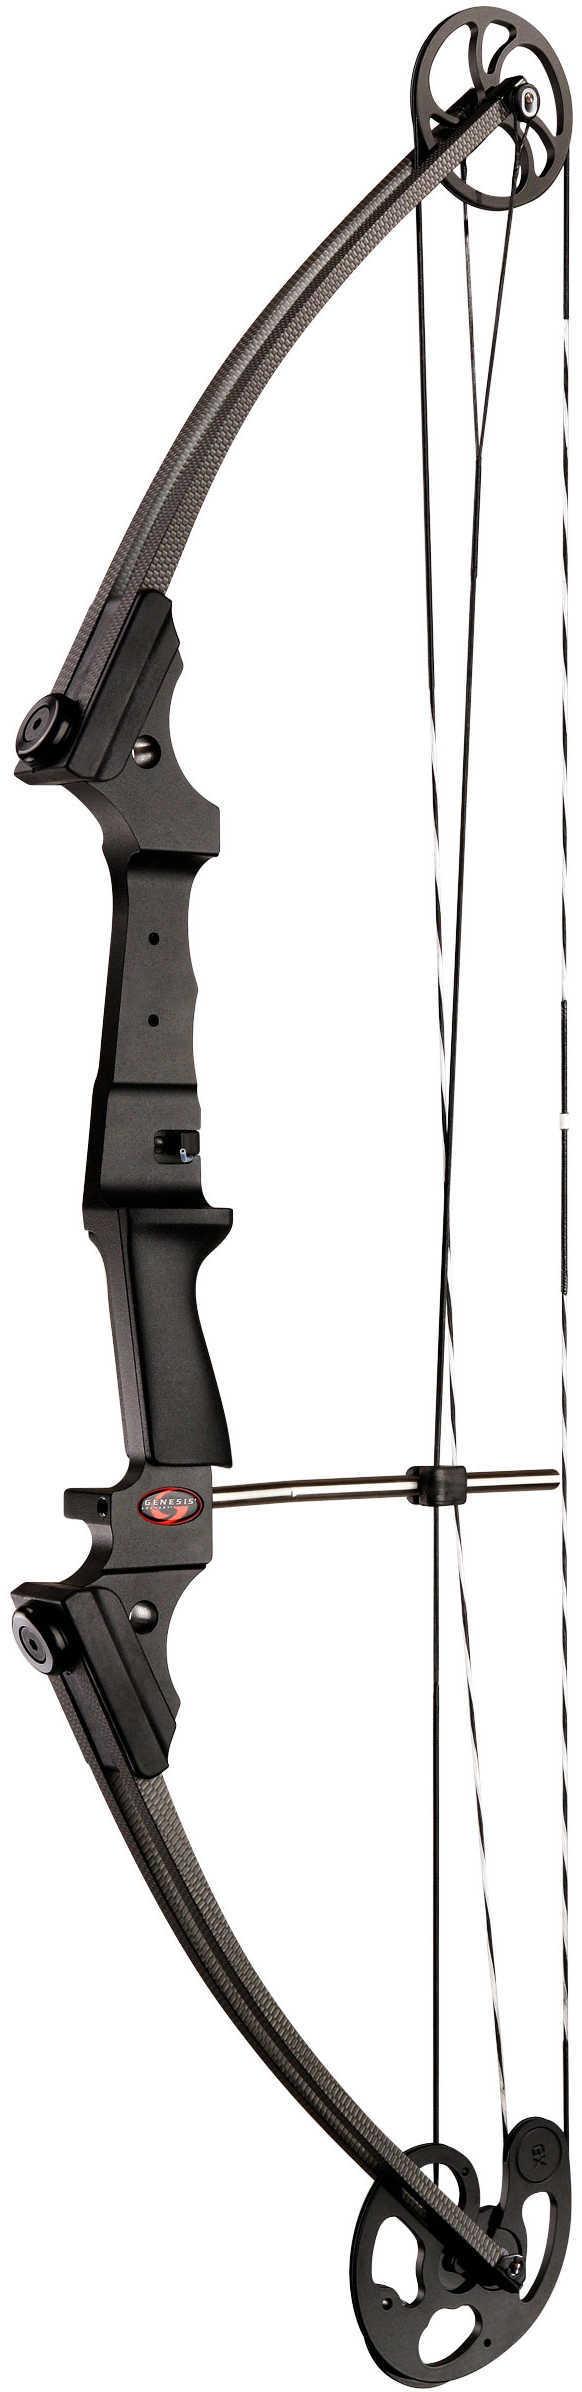 Genesis Bow Carbon RH Model: 12246